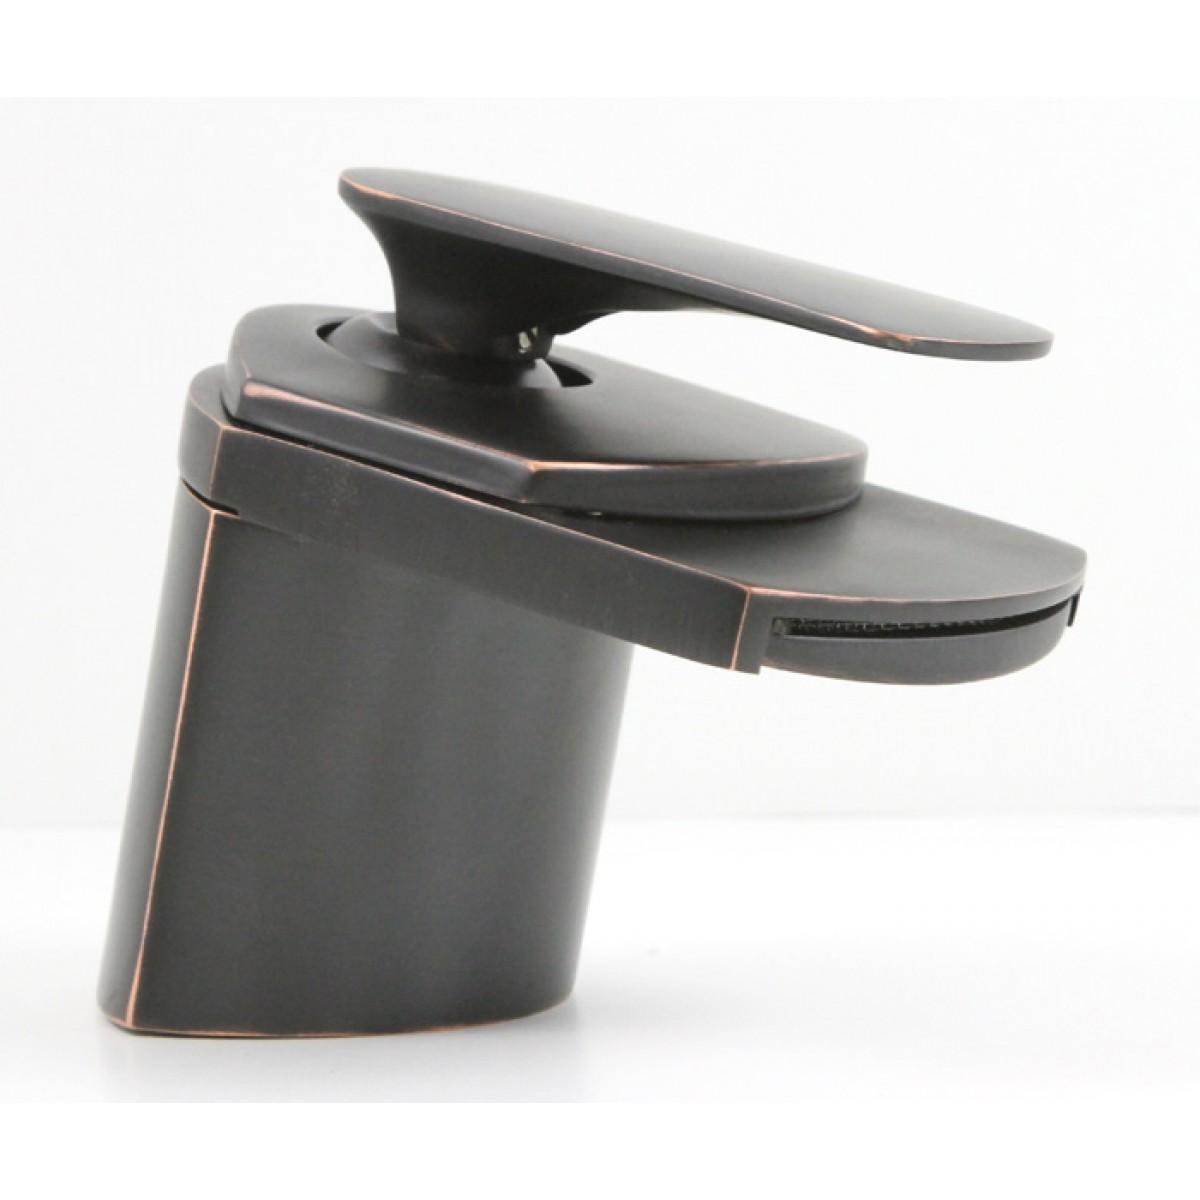 Venetian Bronze Waterfall Flat Spout Single Hole Bathroom Faucet 5 X 2 1 2 Inch